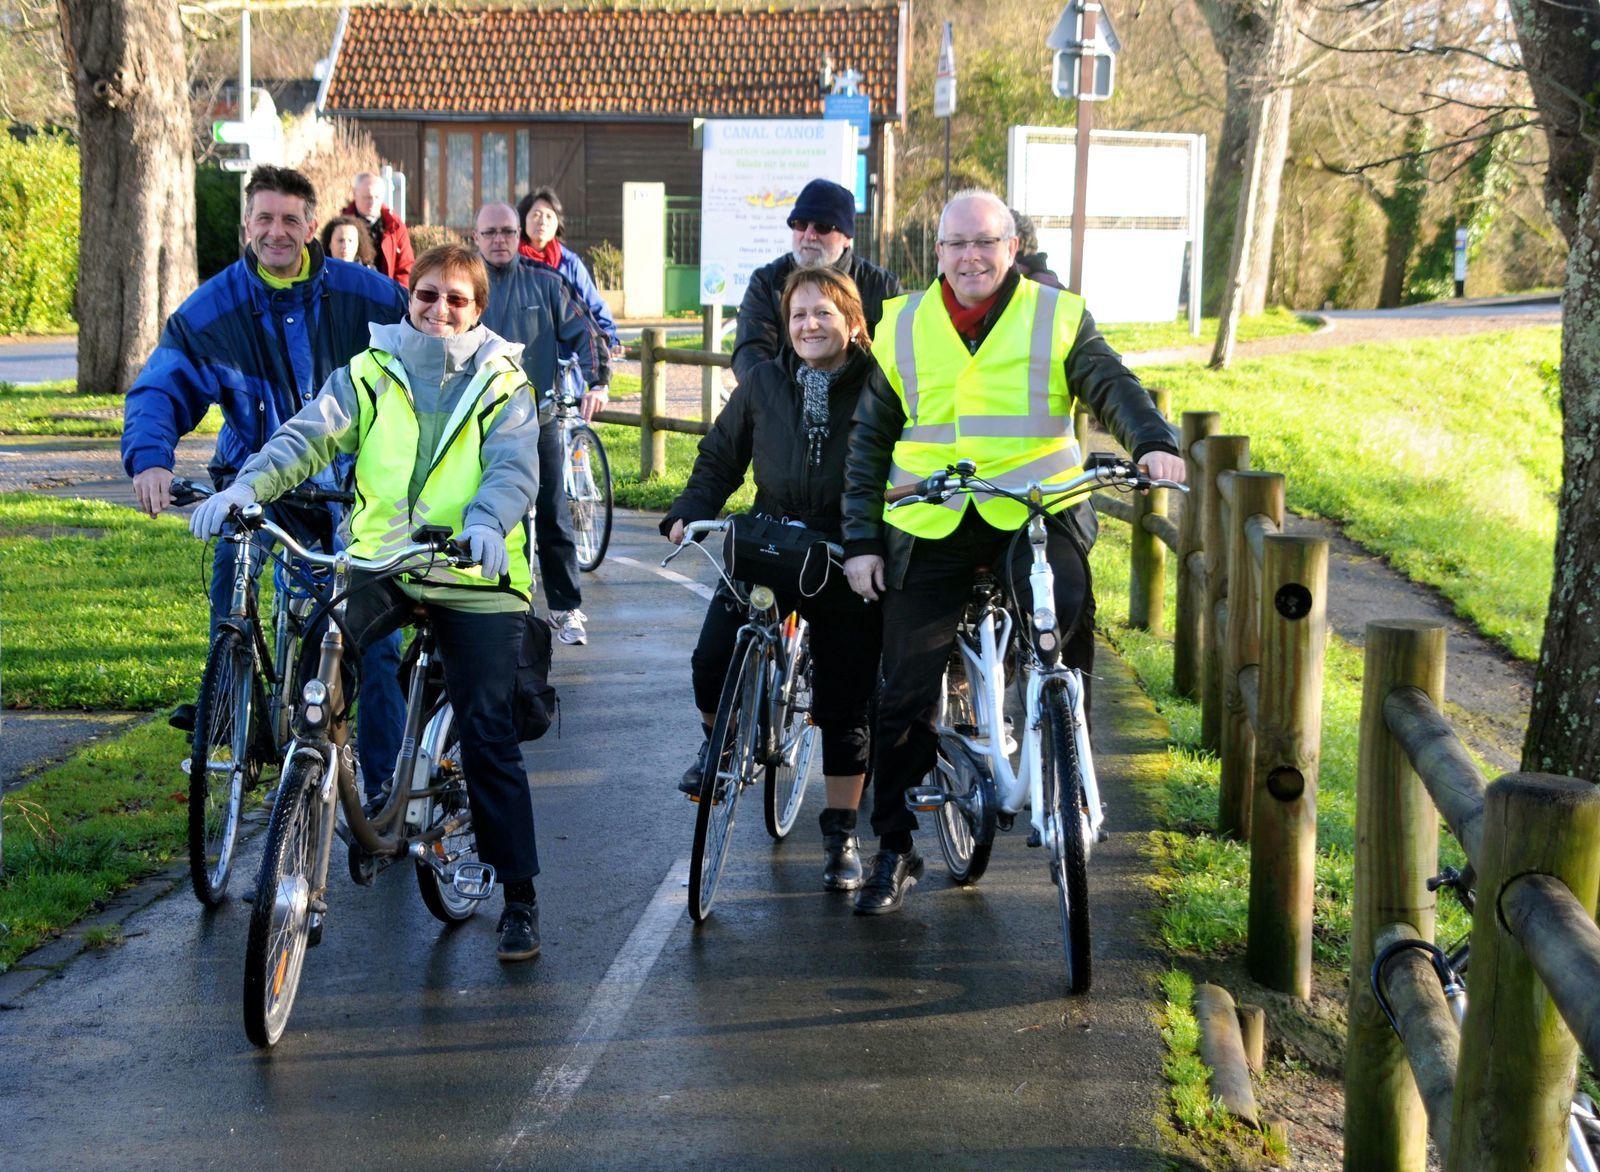 Vélo-citoyen à Périgny